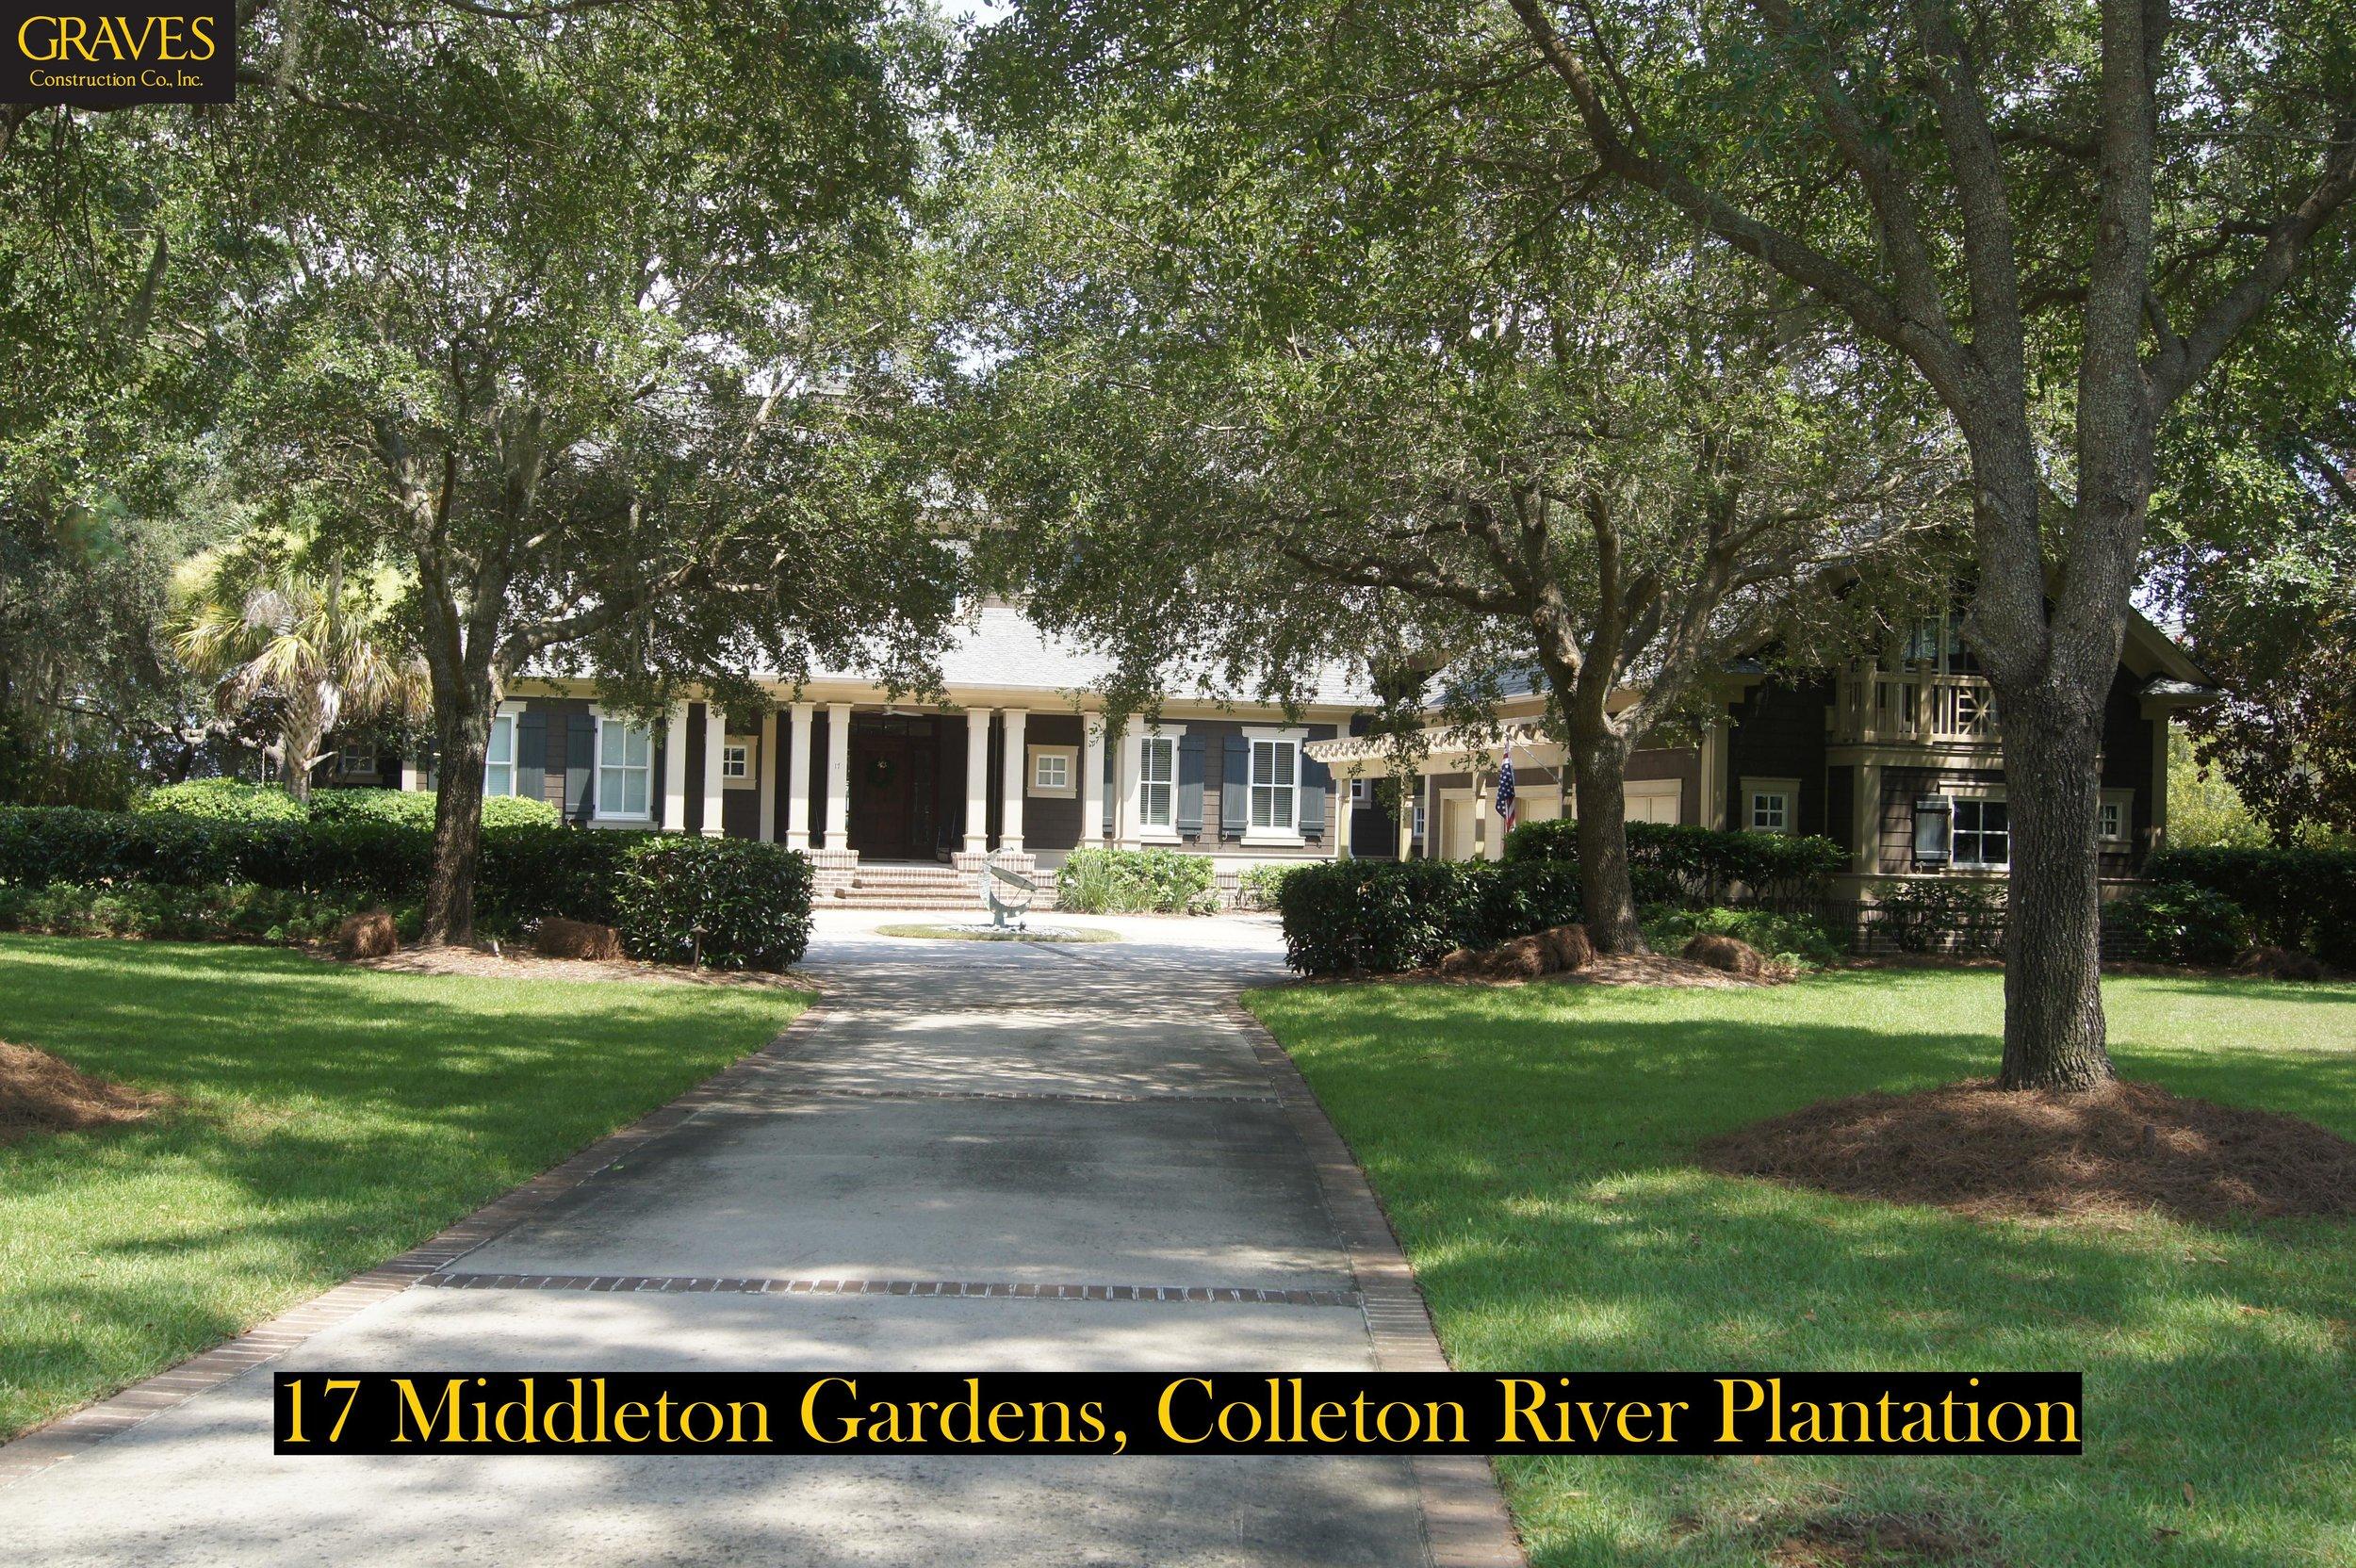 17 Middleton Gardens - 6